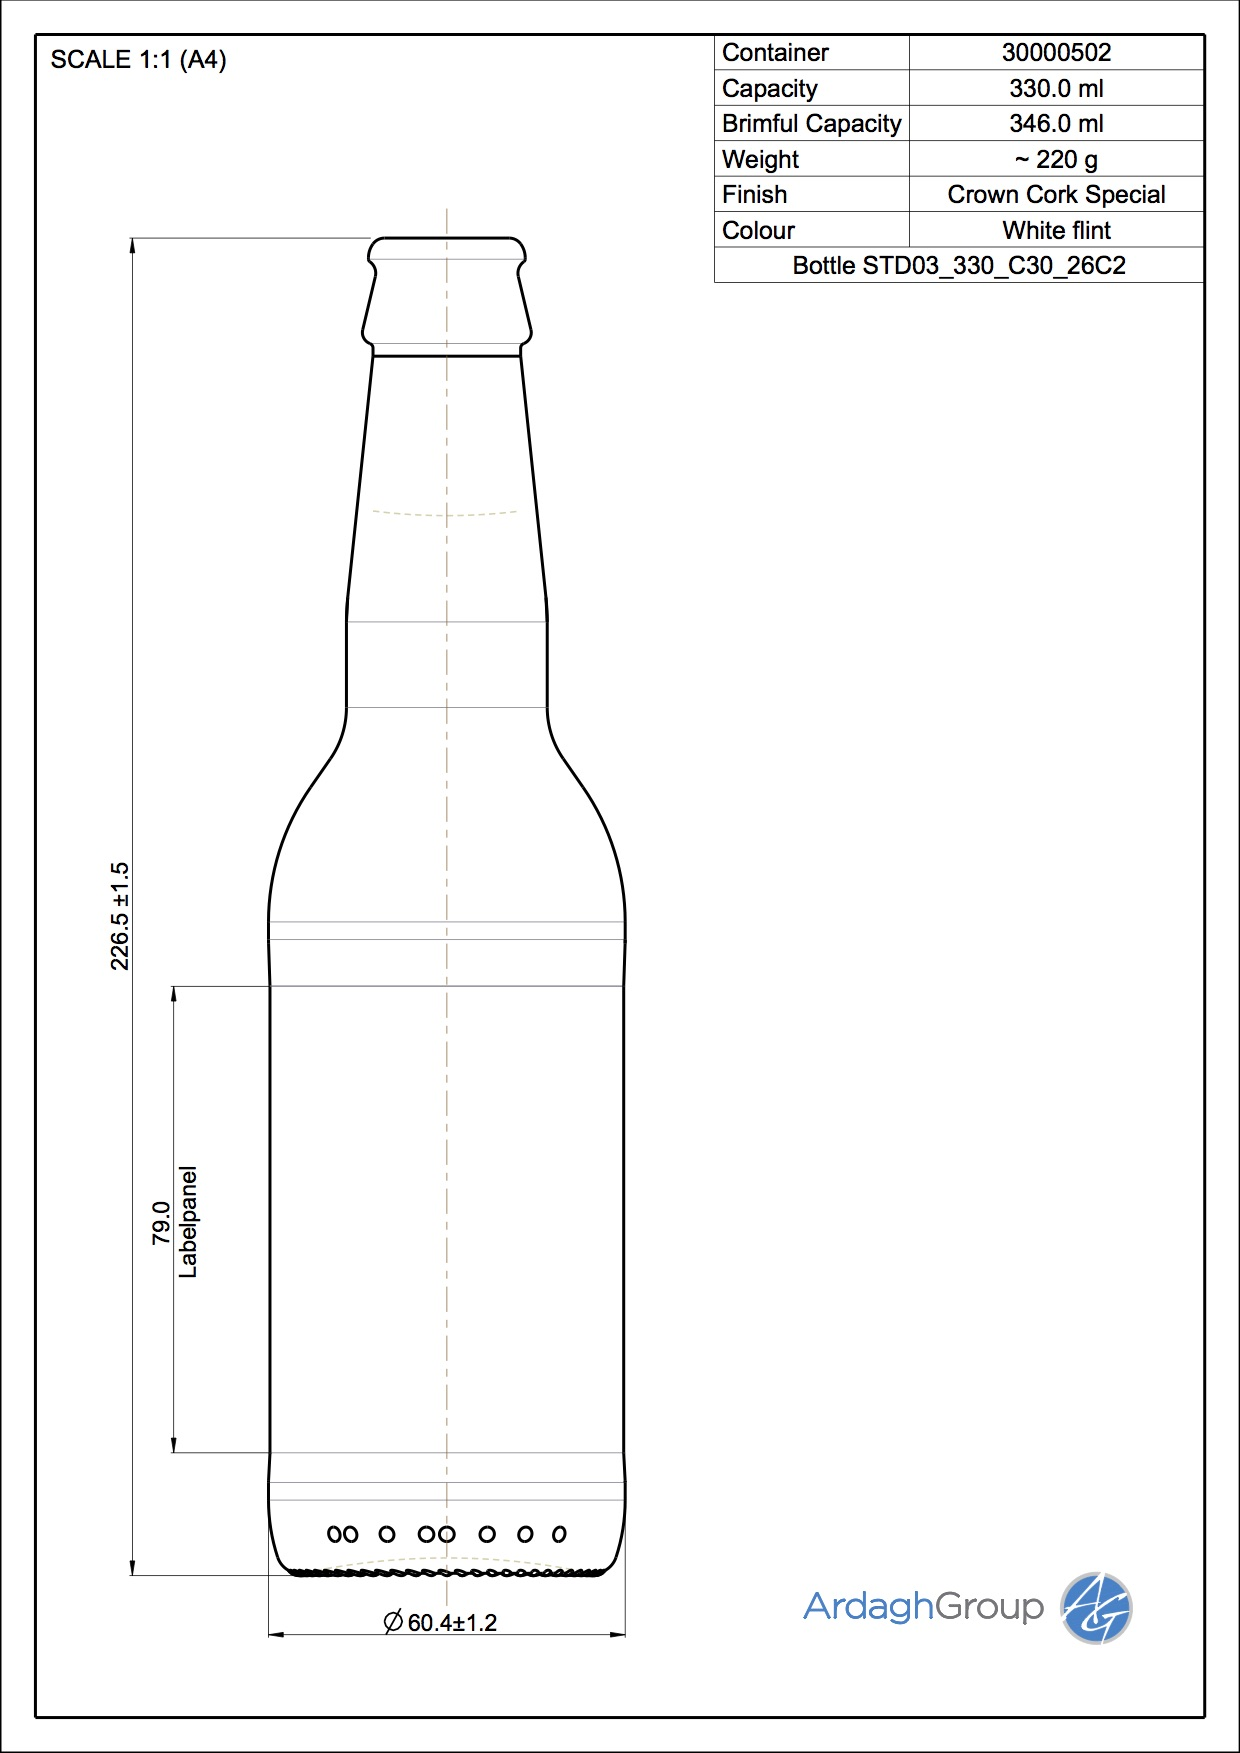 Bottle STD03-330-FL-26C2